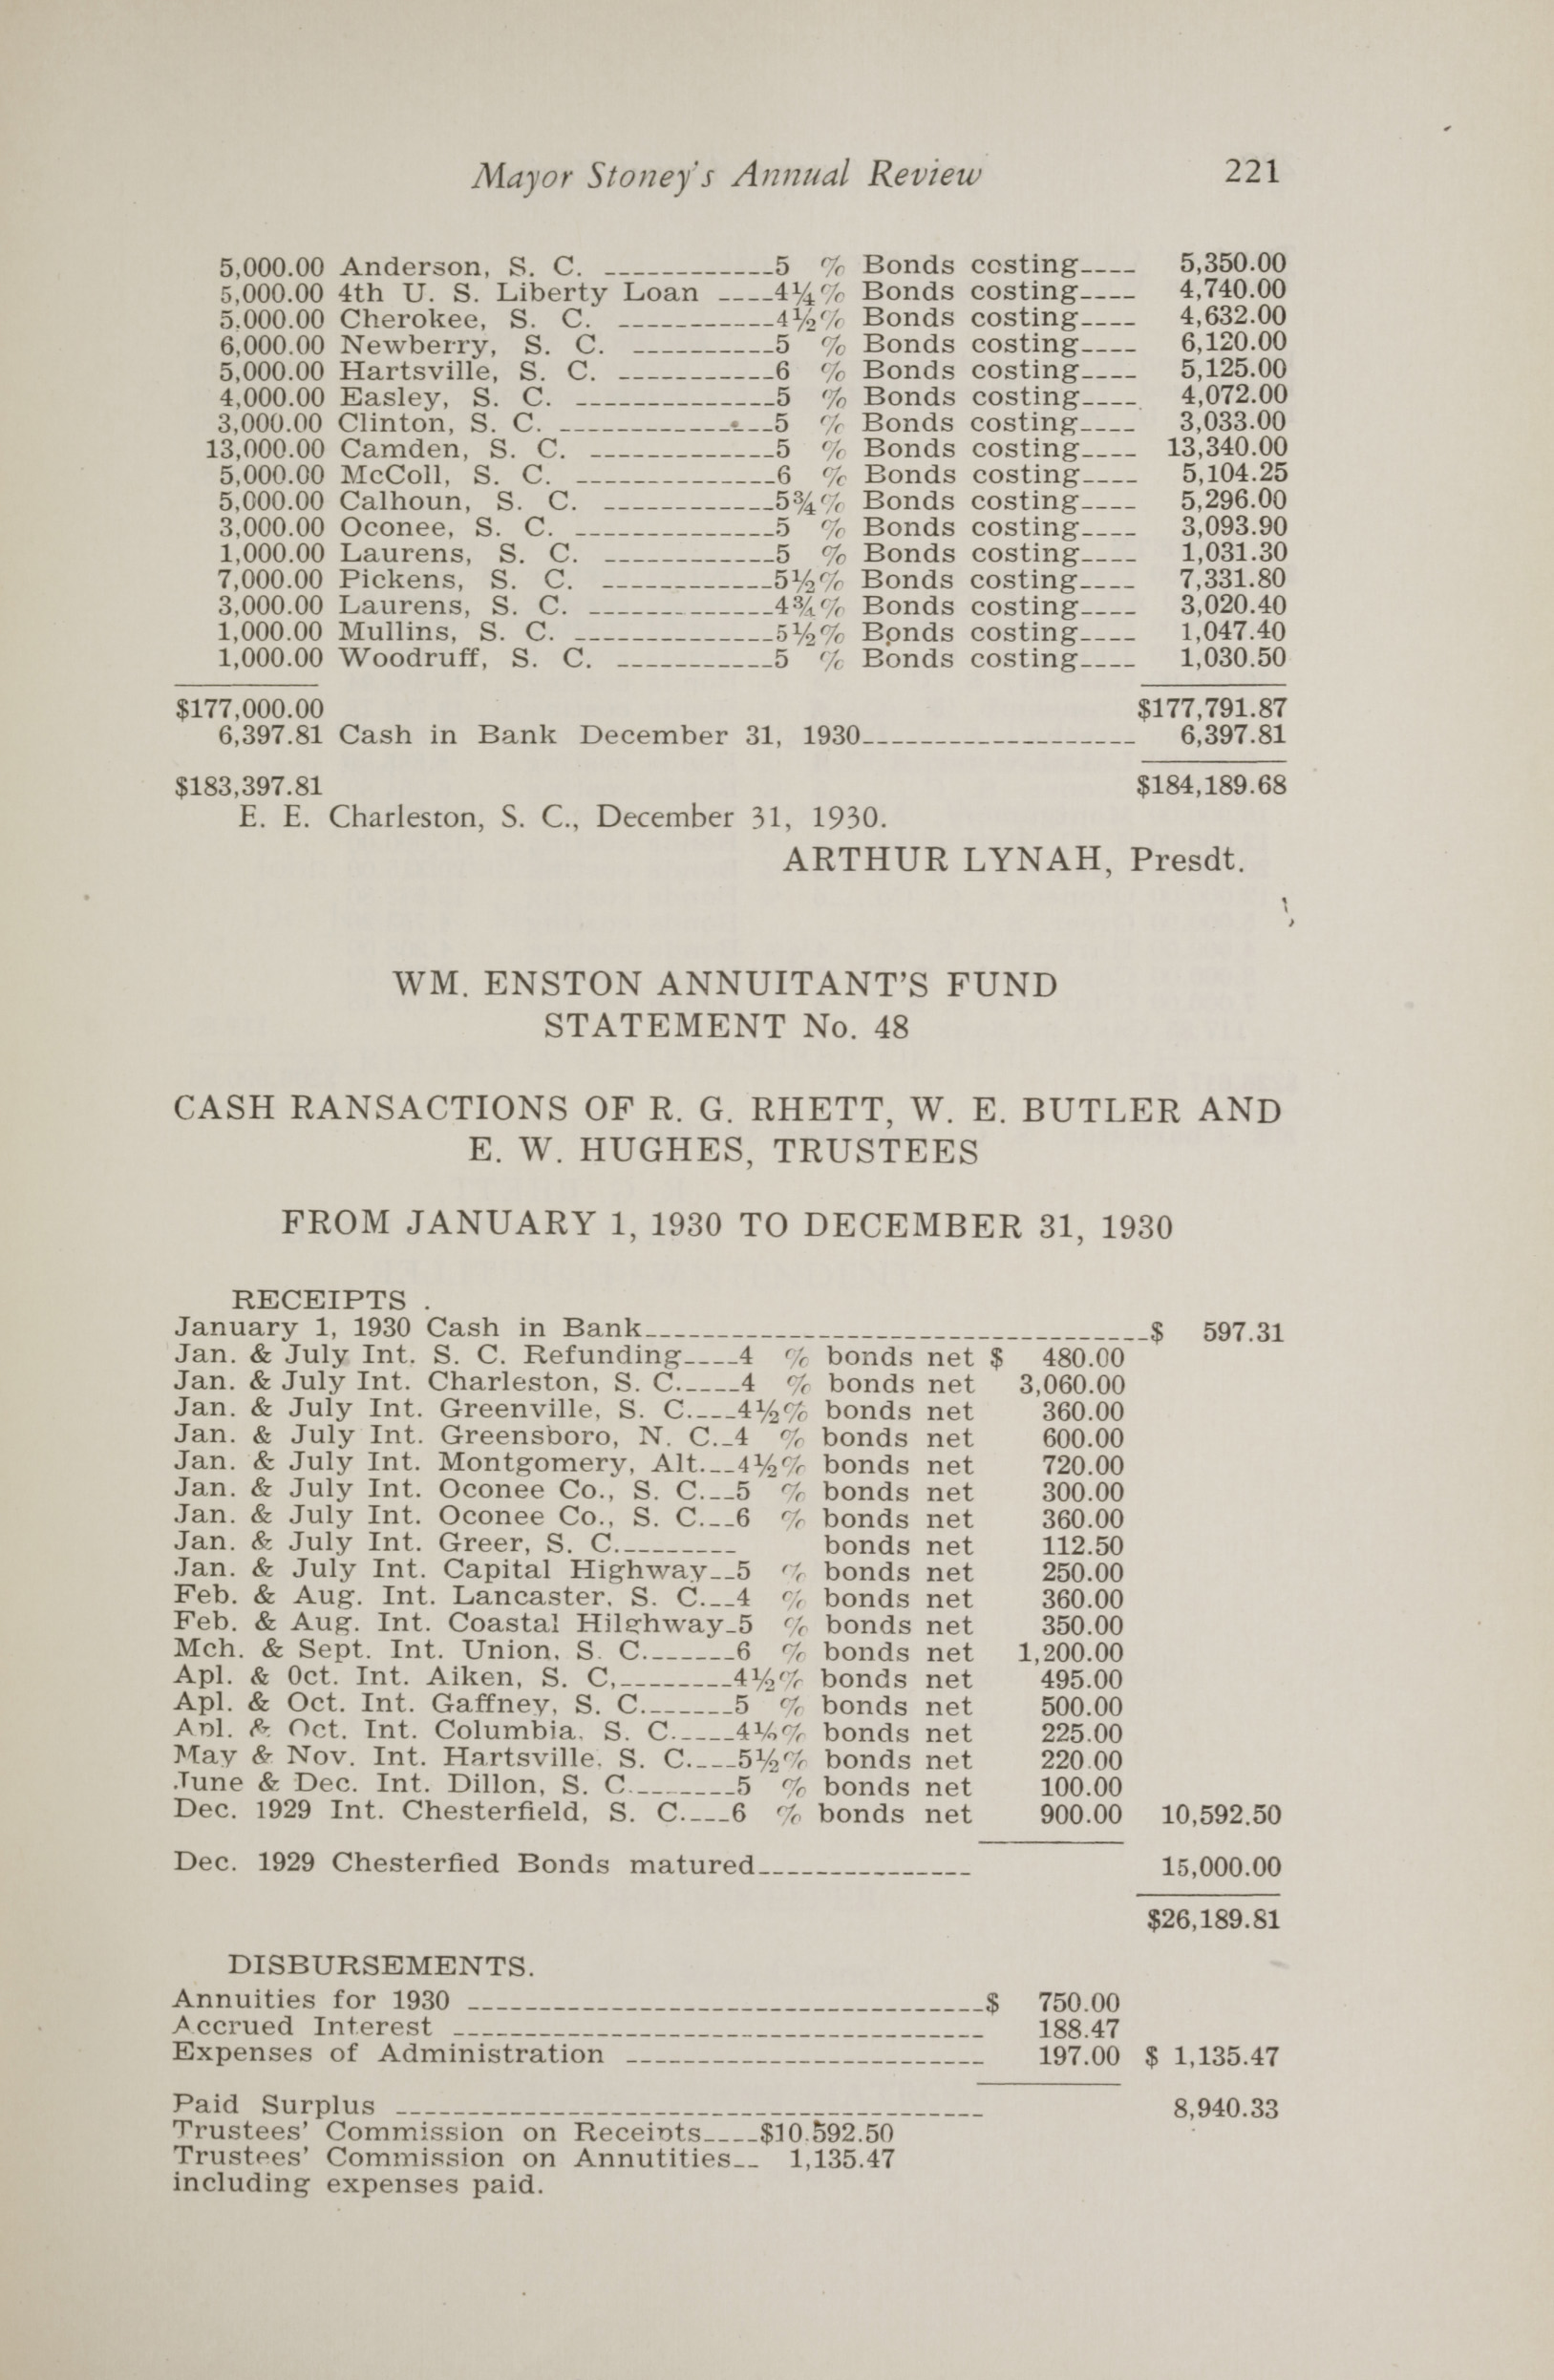 Charleston Yearbook, 1930, page 221